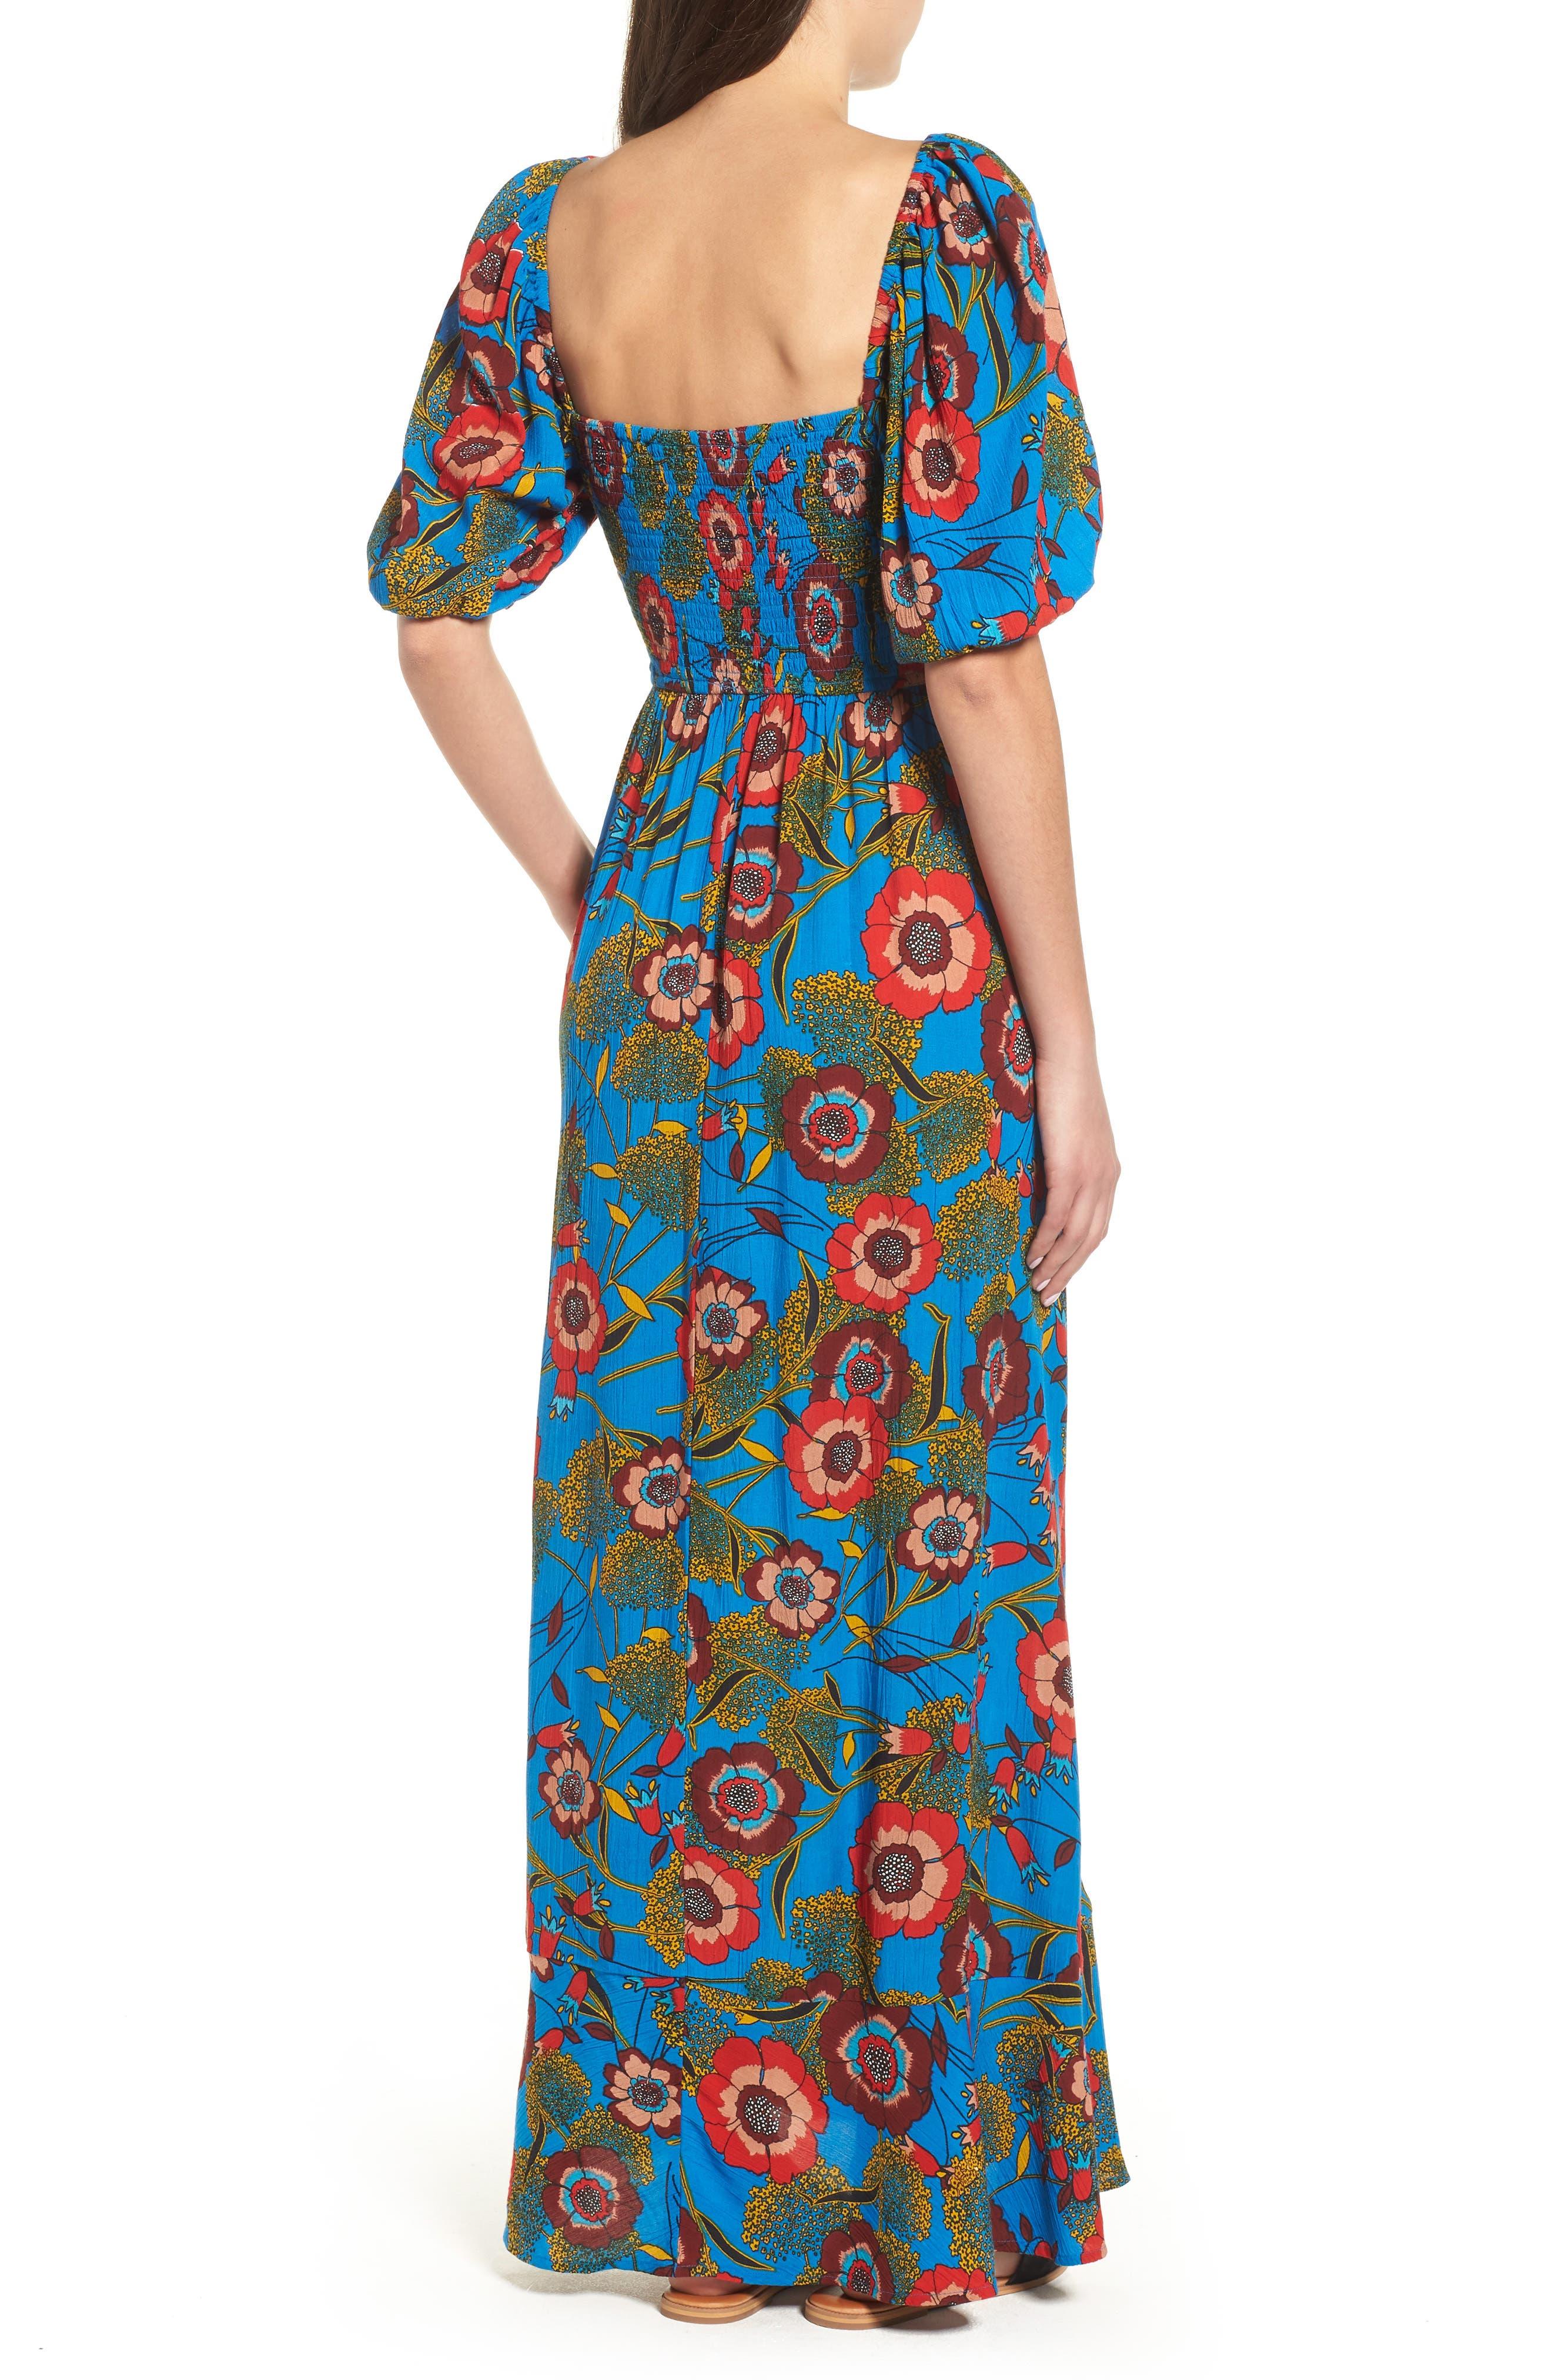 Heirloom Blossom Maxi Dress,                             Alternate thumbnail 2, color,                             Royal/ Blue/ Red